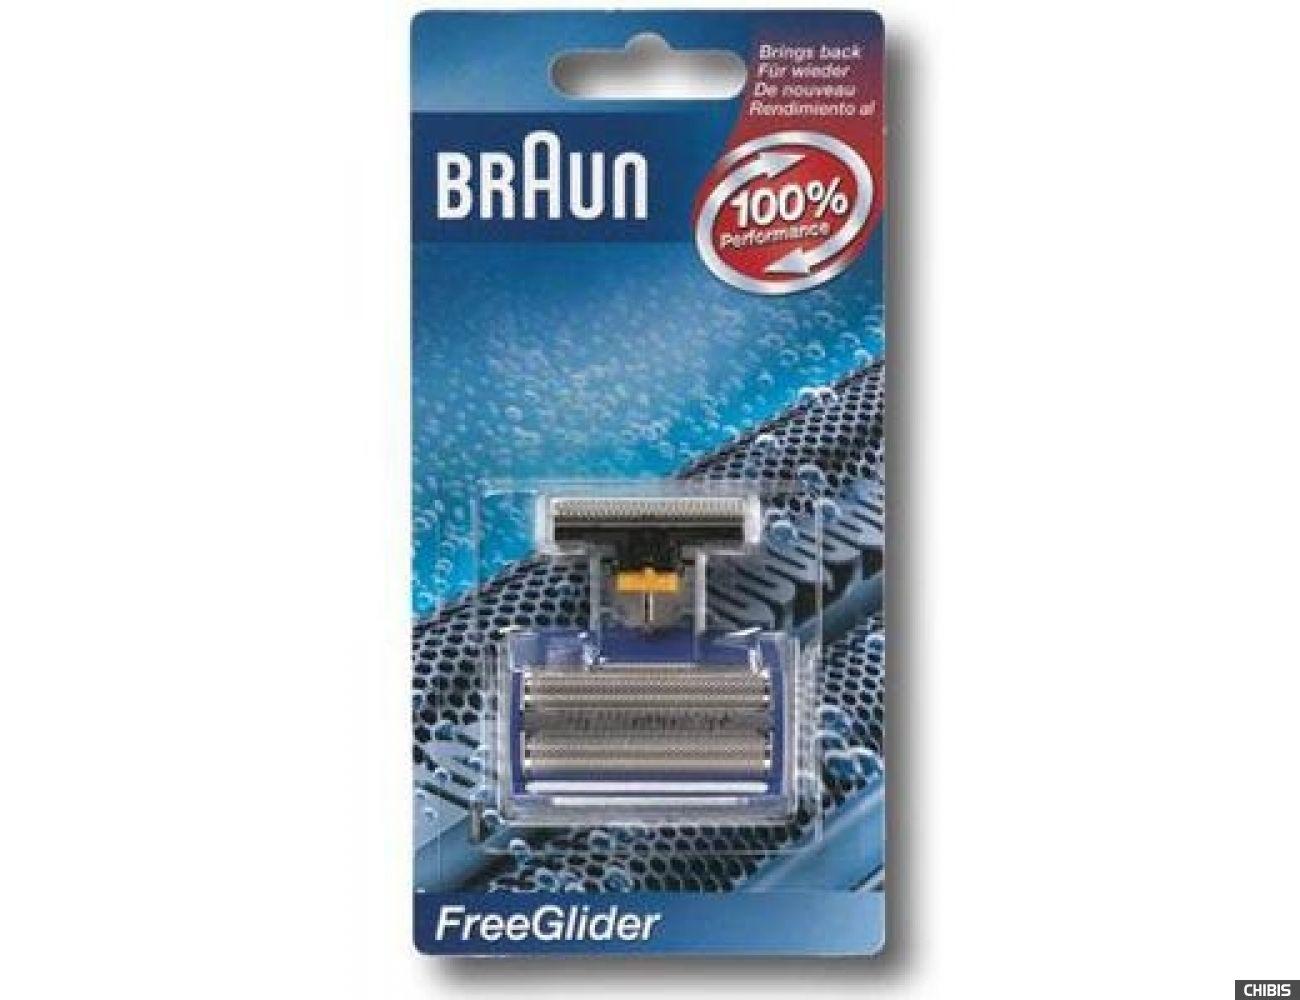 Сетка и режущий блок Braun 6600 FreeGlider (5710761) 4210201300328